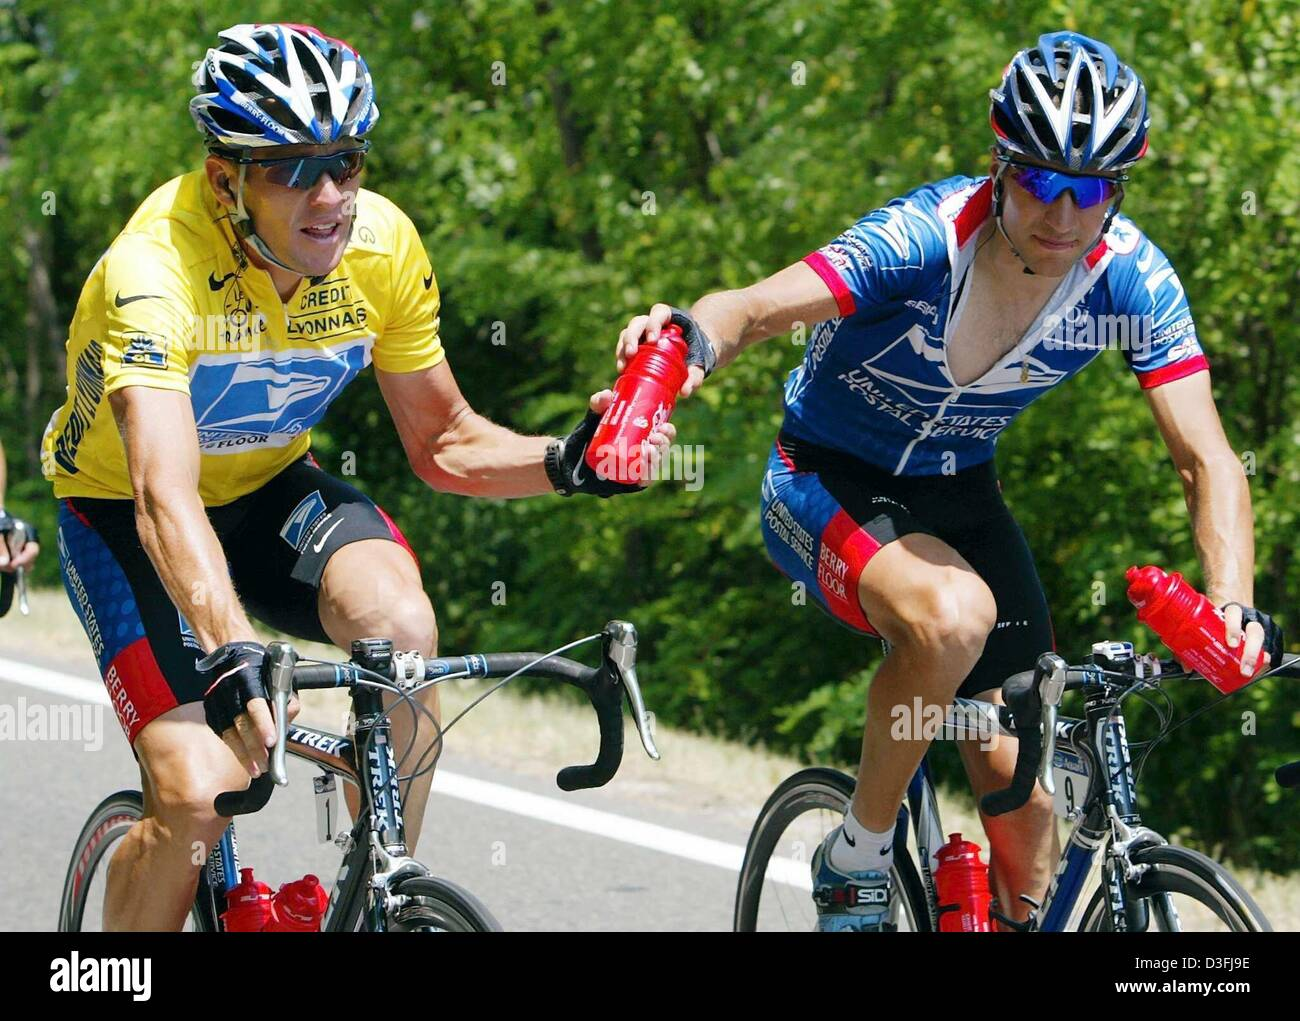 Dpa Us Cyclist Lance Armstrong Stock Photos   Dpa Us Cyclist Lance ... b752f4ff0